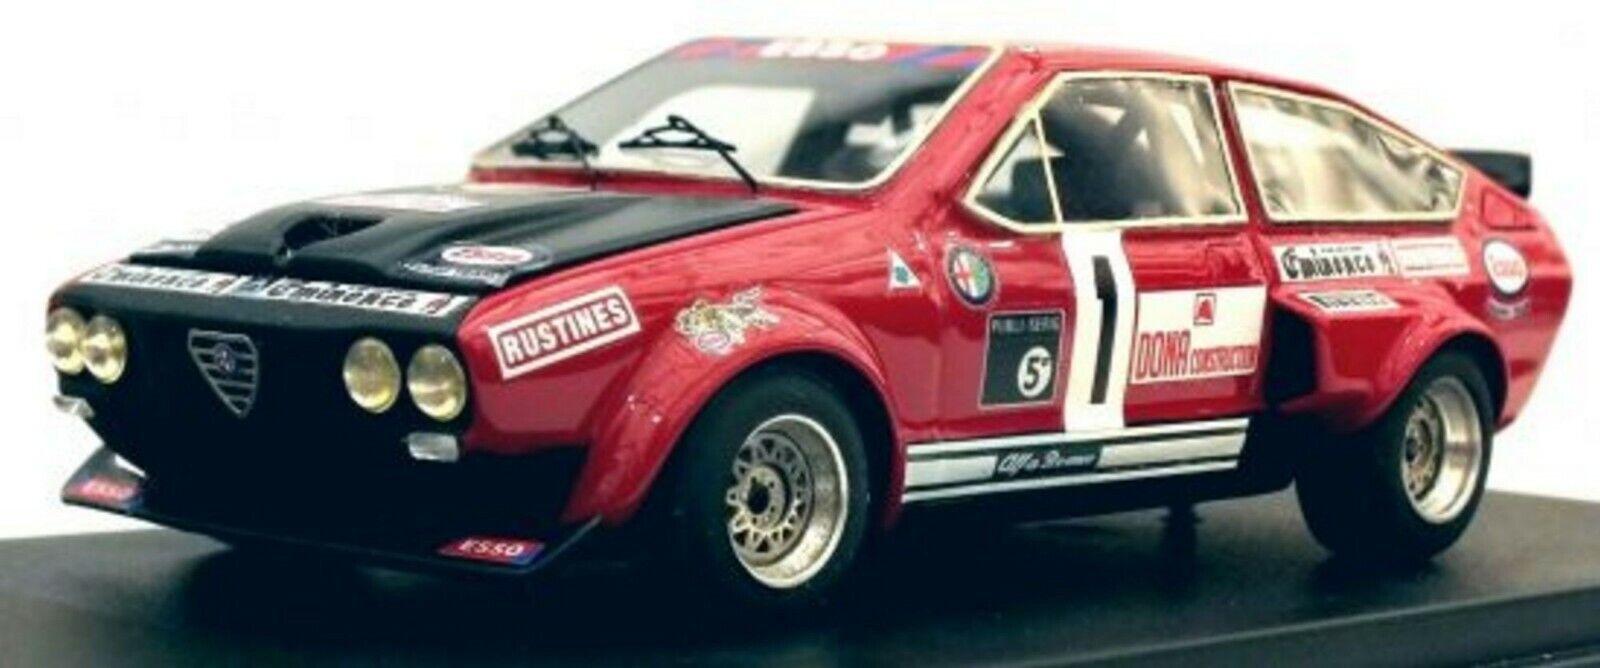 kit alfa romeo gtv v8 gr.5  1 rally criterion of the touraine 1978-tron 1 43  livraison et retours gratuits